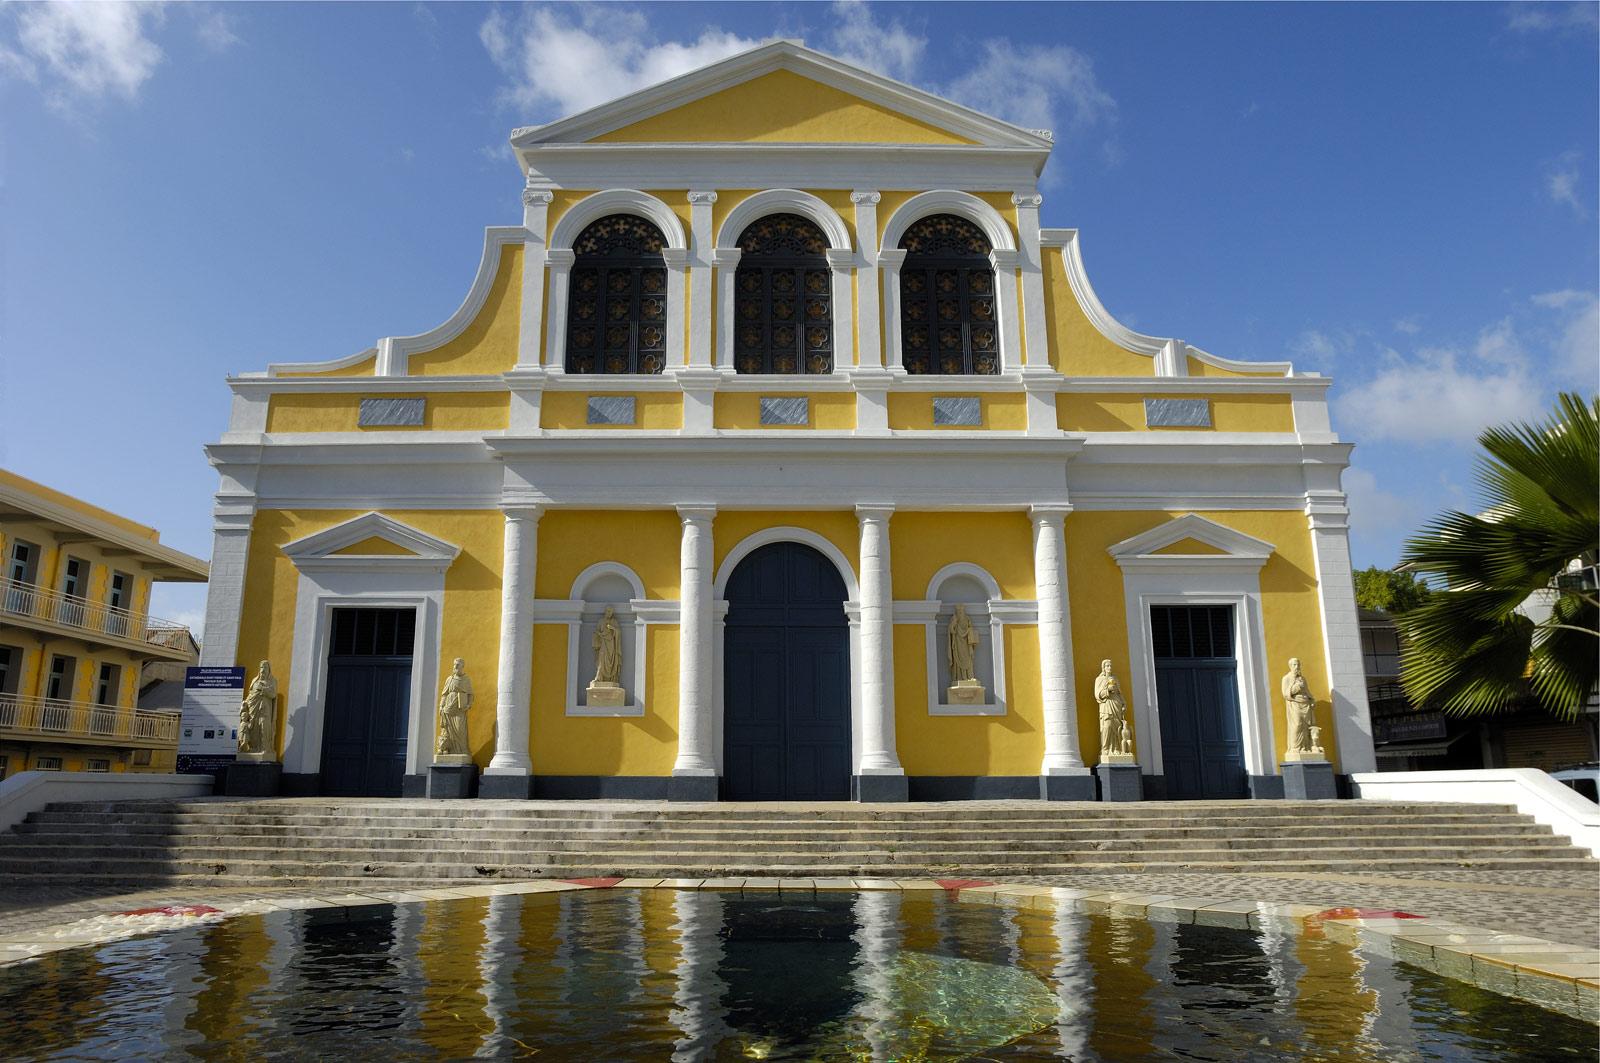 http://www.deshotelsetdesiles.com/hotel-vol-guadeloupe/photos/cathedrale-saint-pierre-et-.jpg